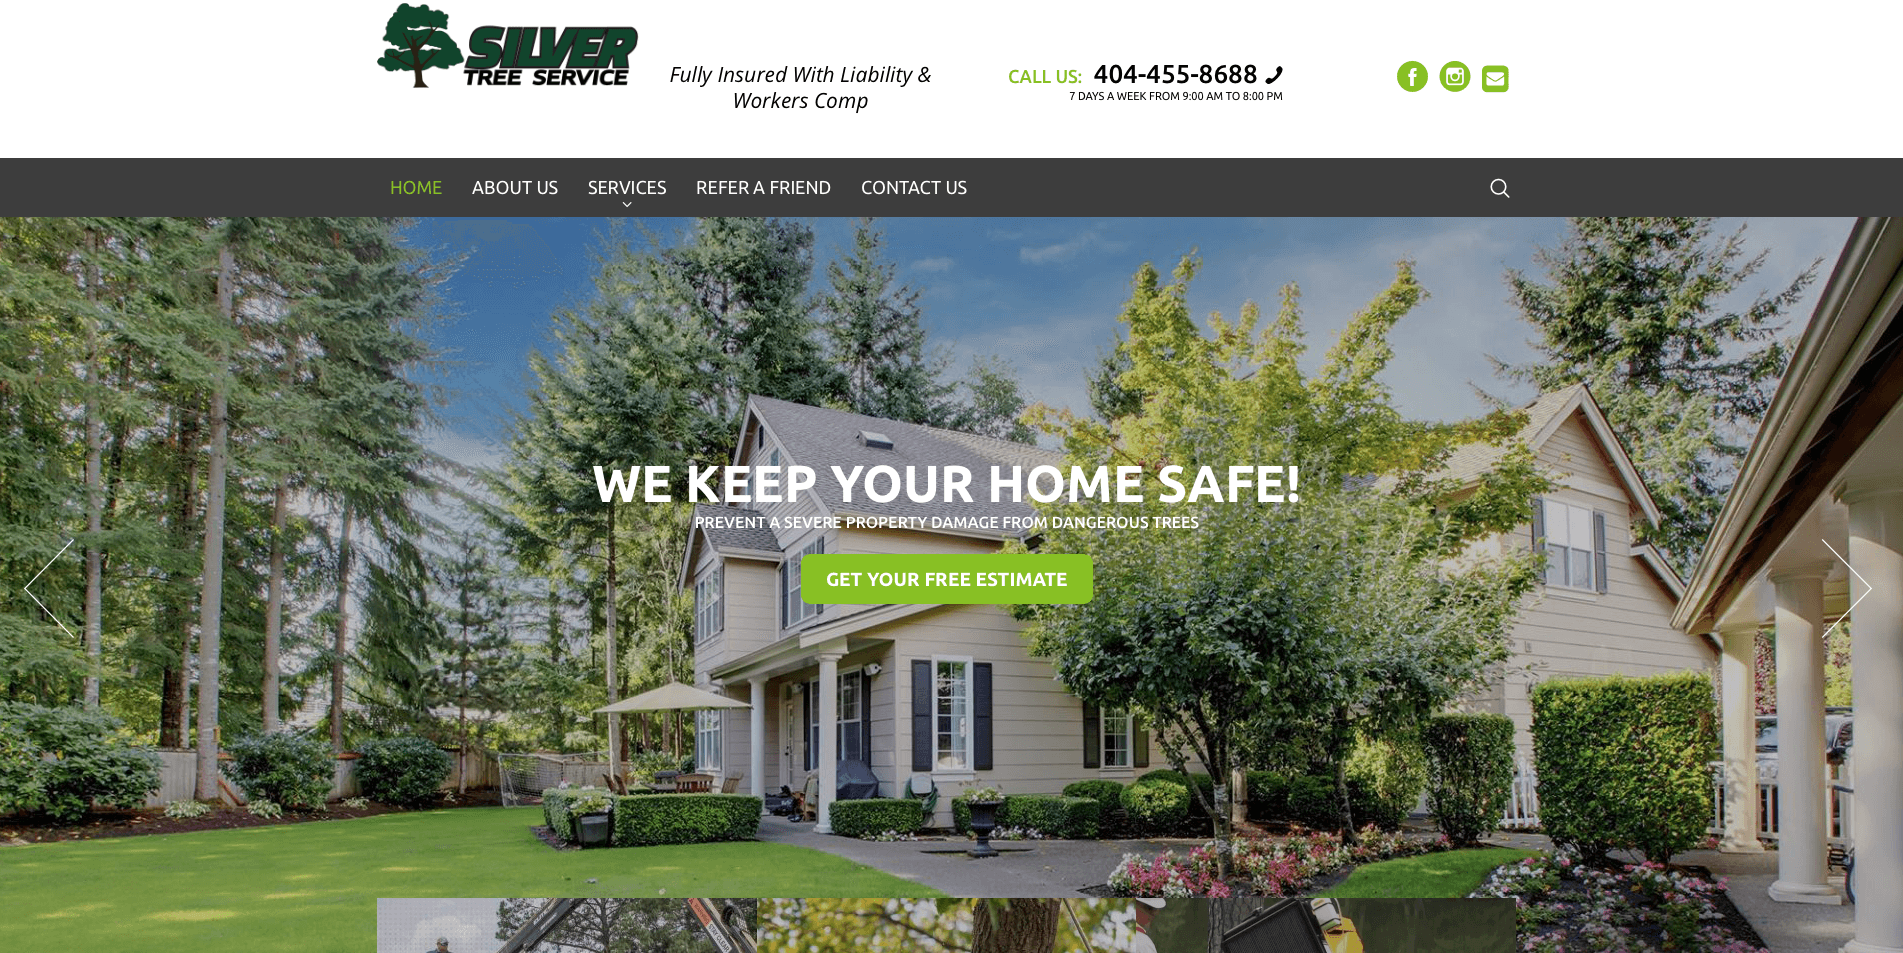 Besavant Web Design Silver Tree Service Atlanta